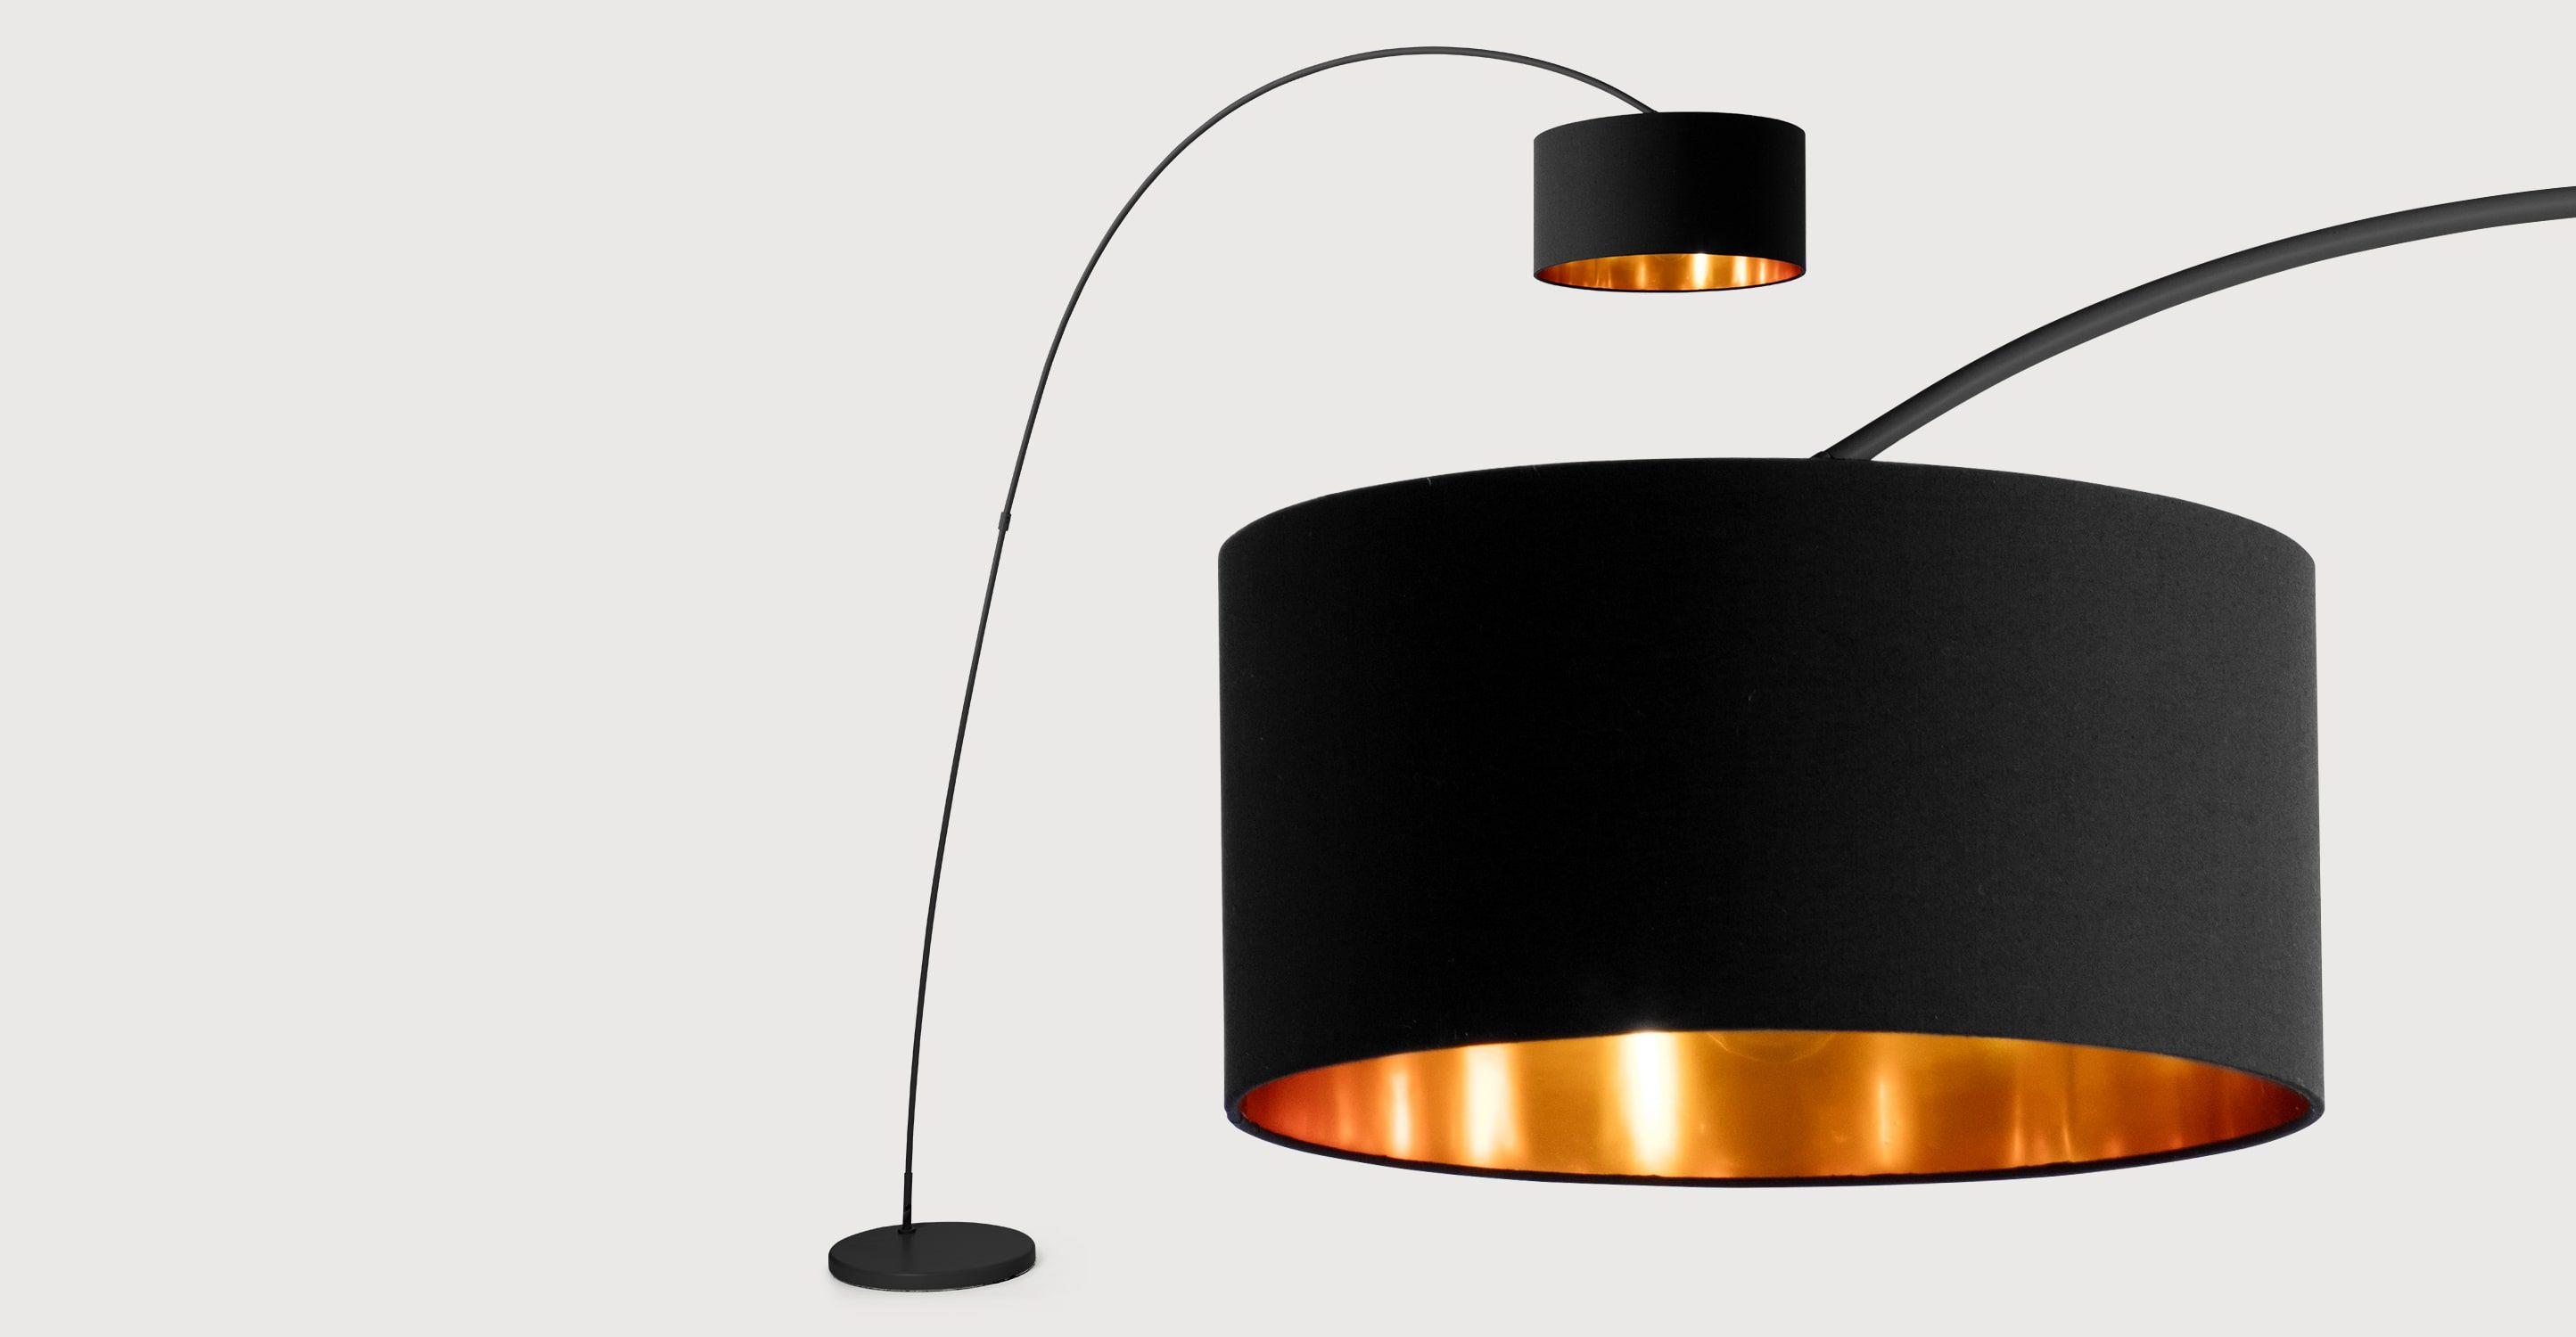 Staande Lampen Industrieel : Vloerlamp industrieel marktplaats staande lamp hout marktplaats